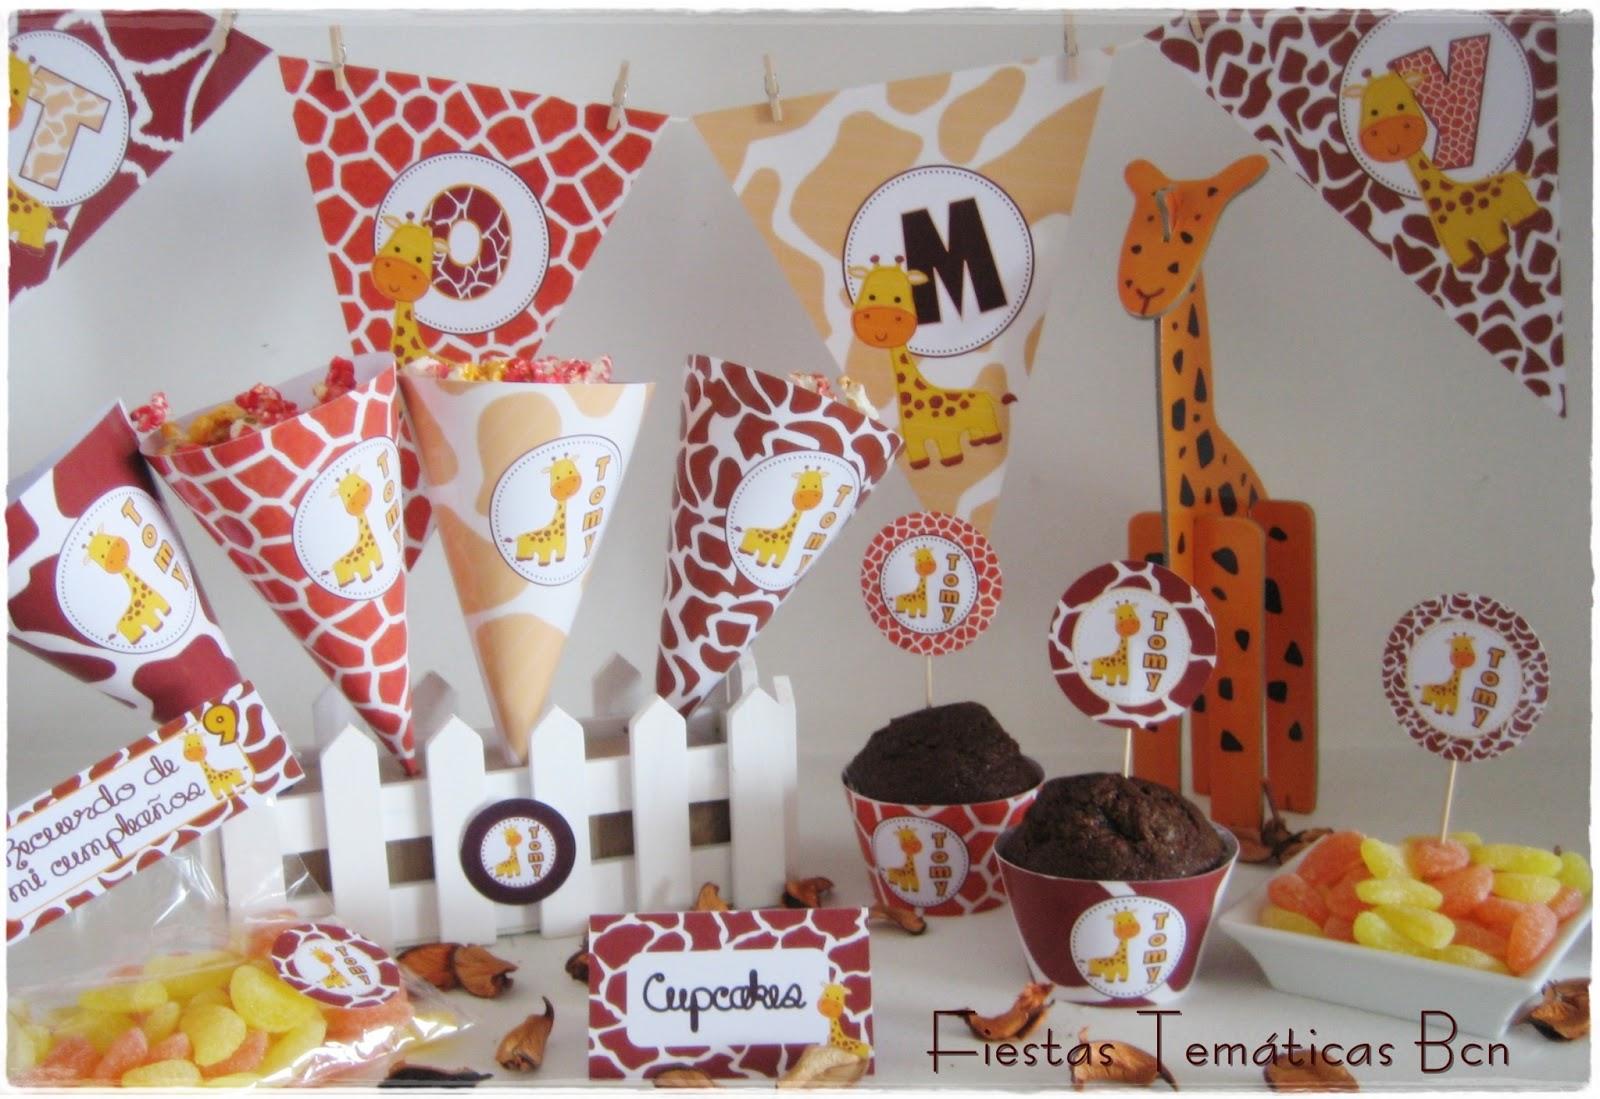 Fiestas tem ticas bcn kits de fiesta imprimibles kit - Decoracion fiestas bebes ...